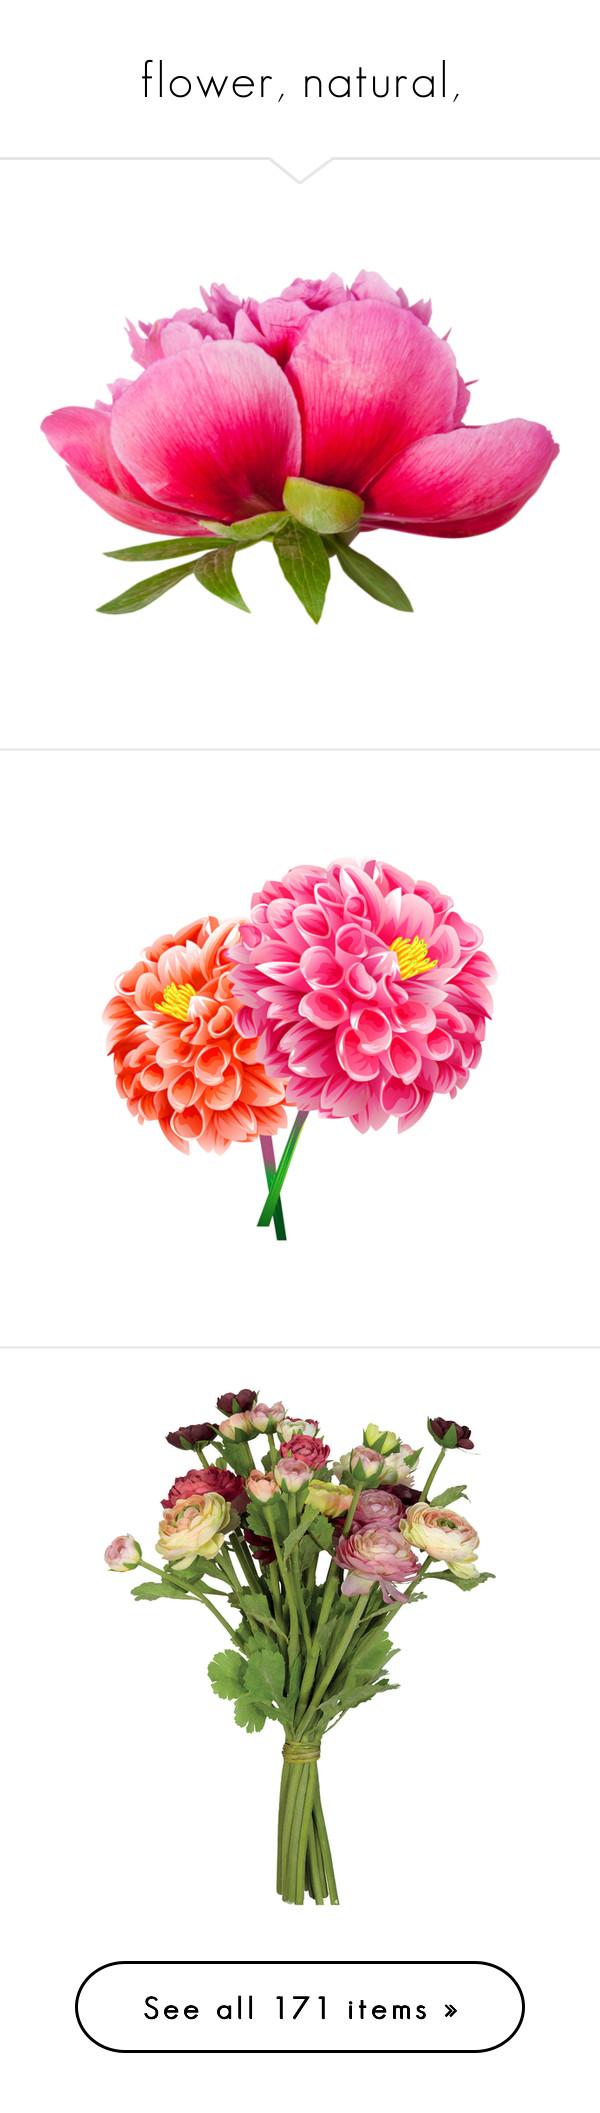 Home decor artificial flowers  flower natural